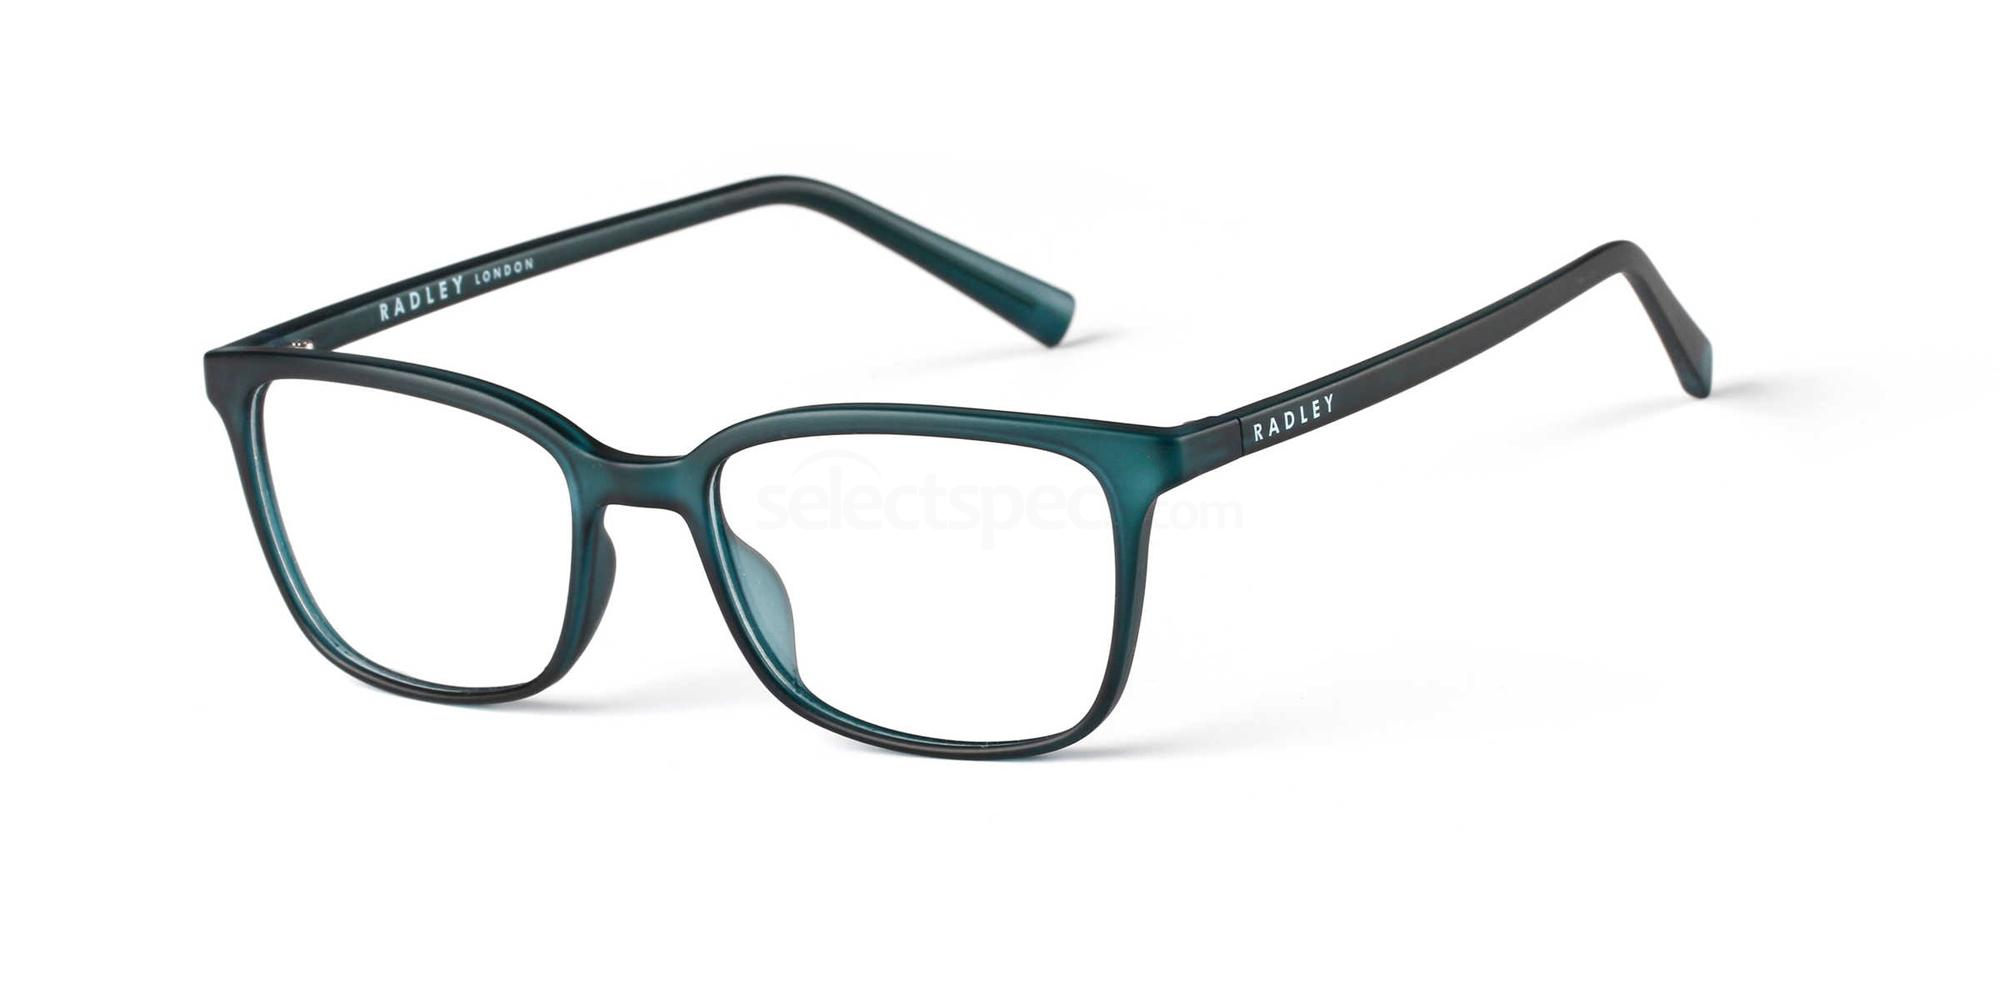 107 RDO-15509 Glasses, Radley London